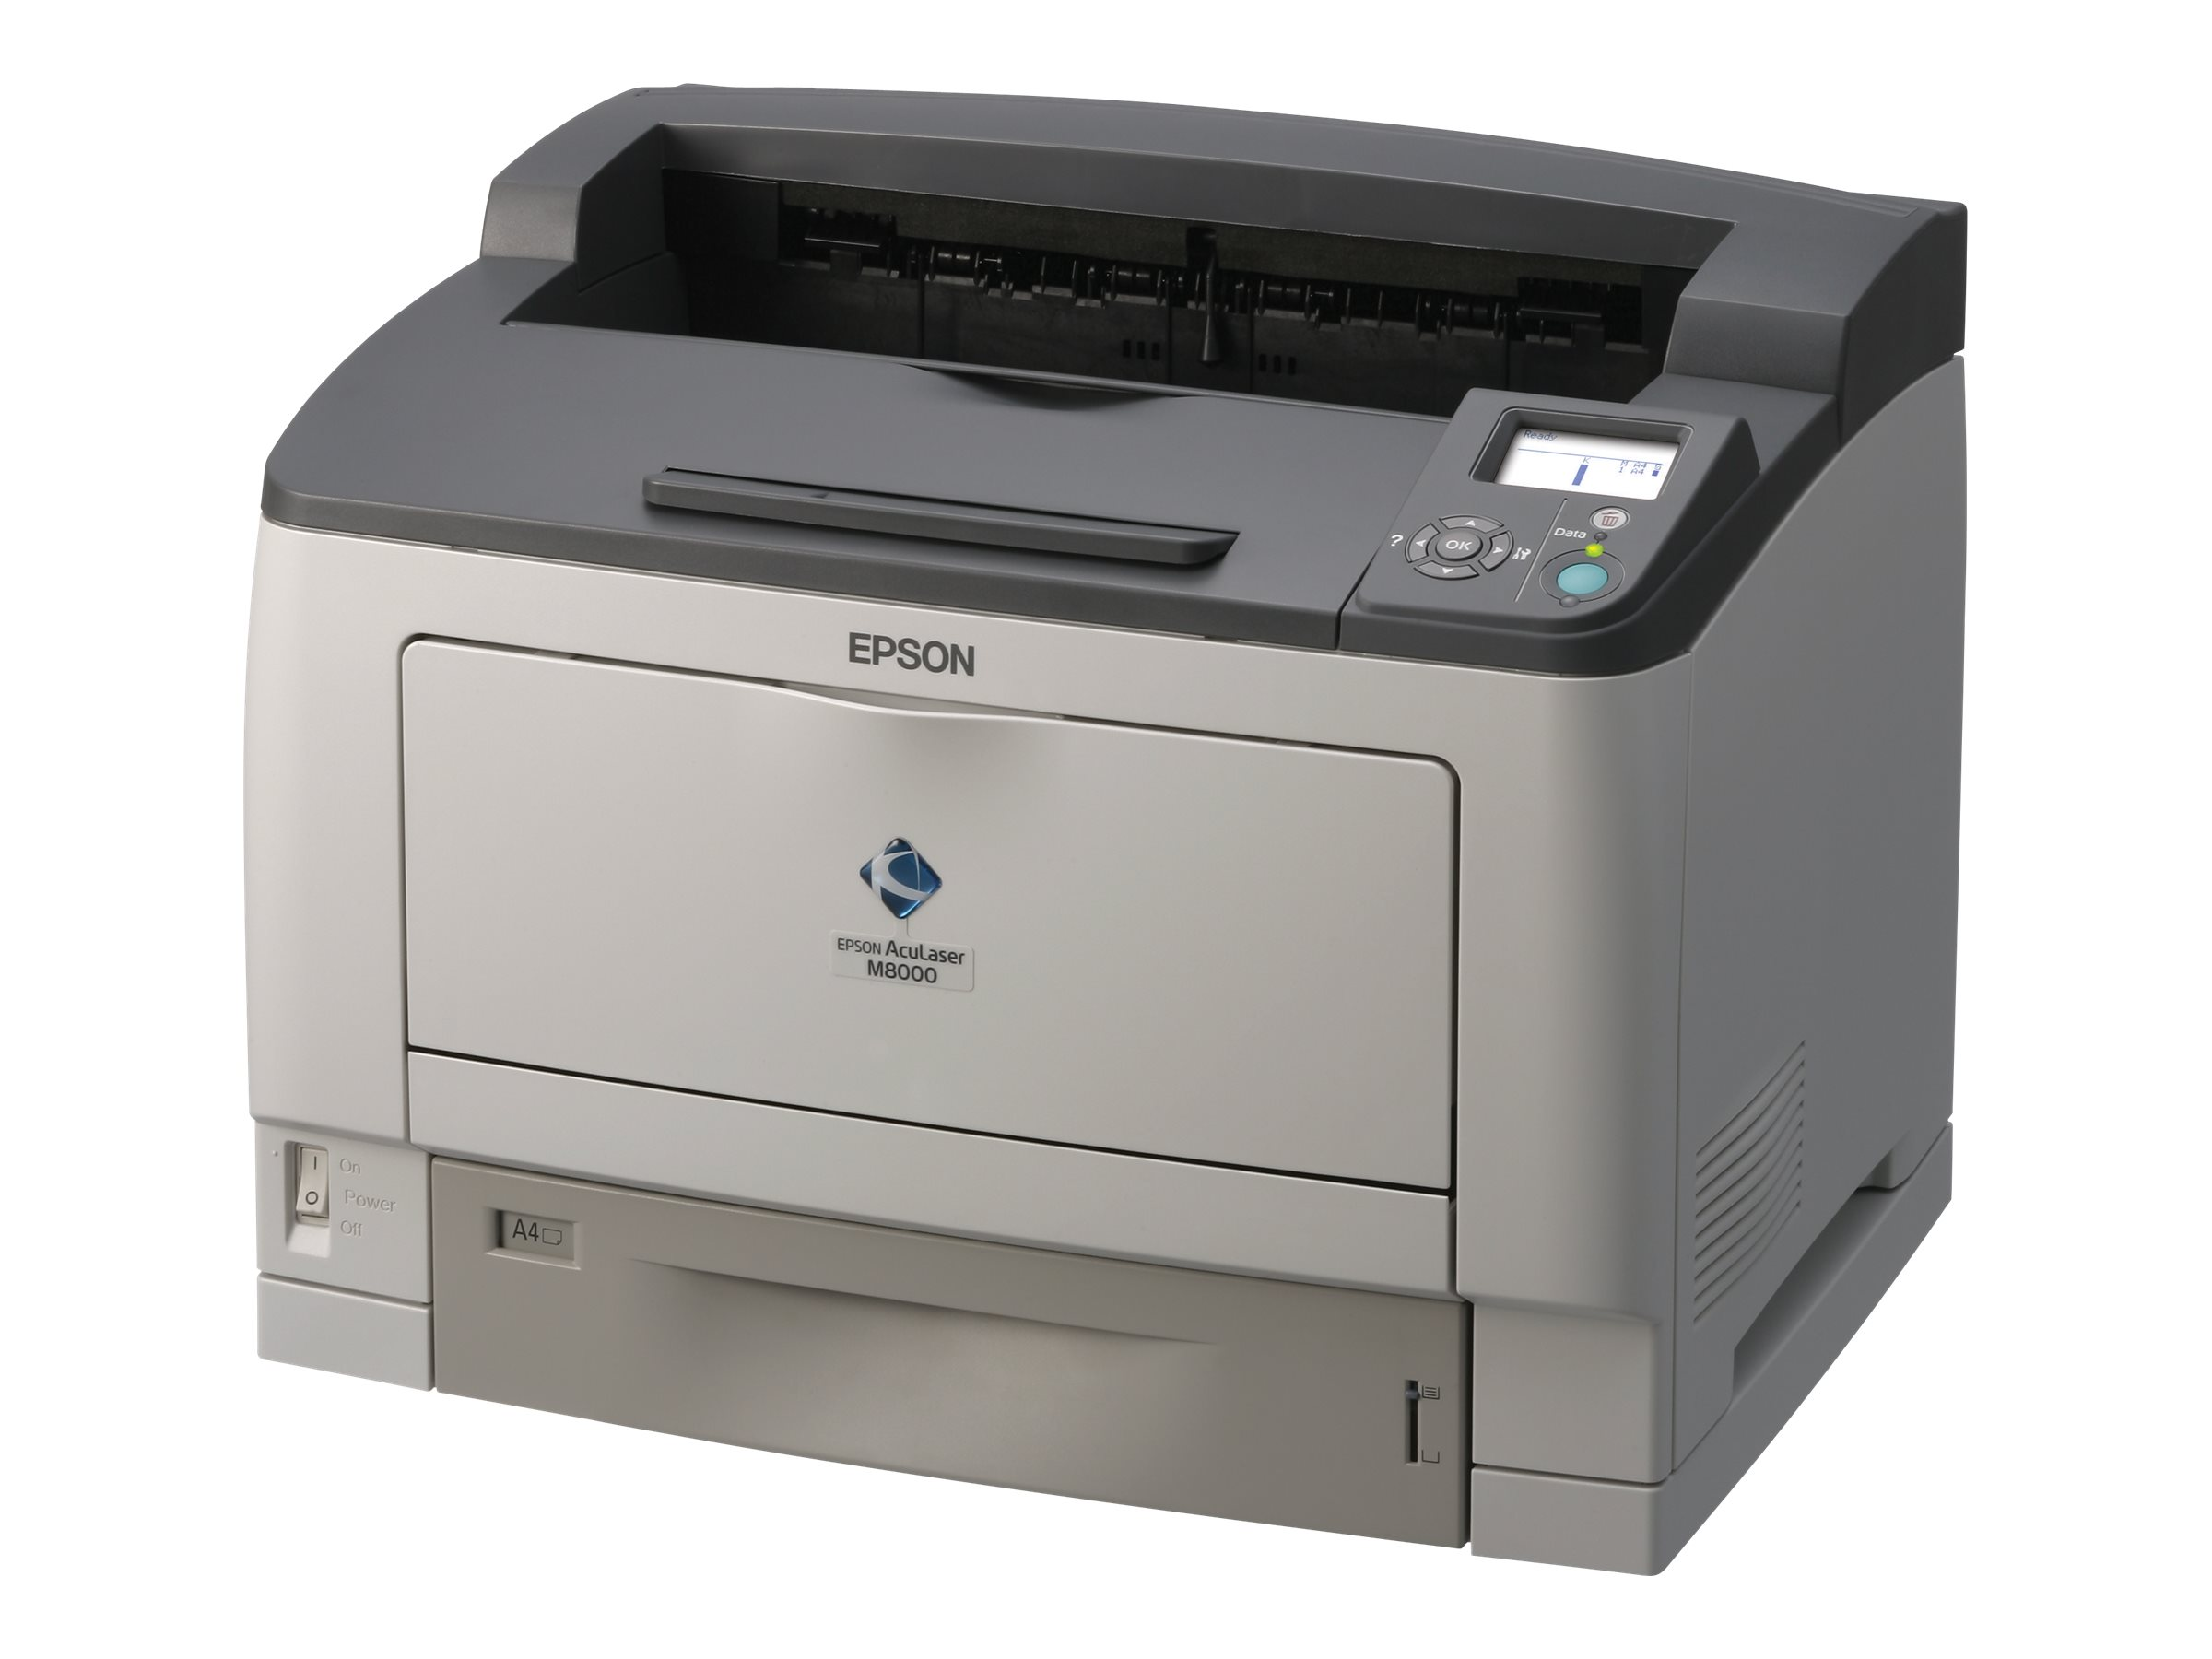 Epson AcuLaser M8000N - Drucker - monochrom - Laser - A3 - 1200 dpi